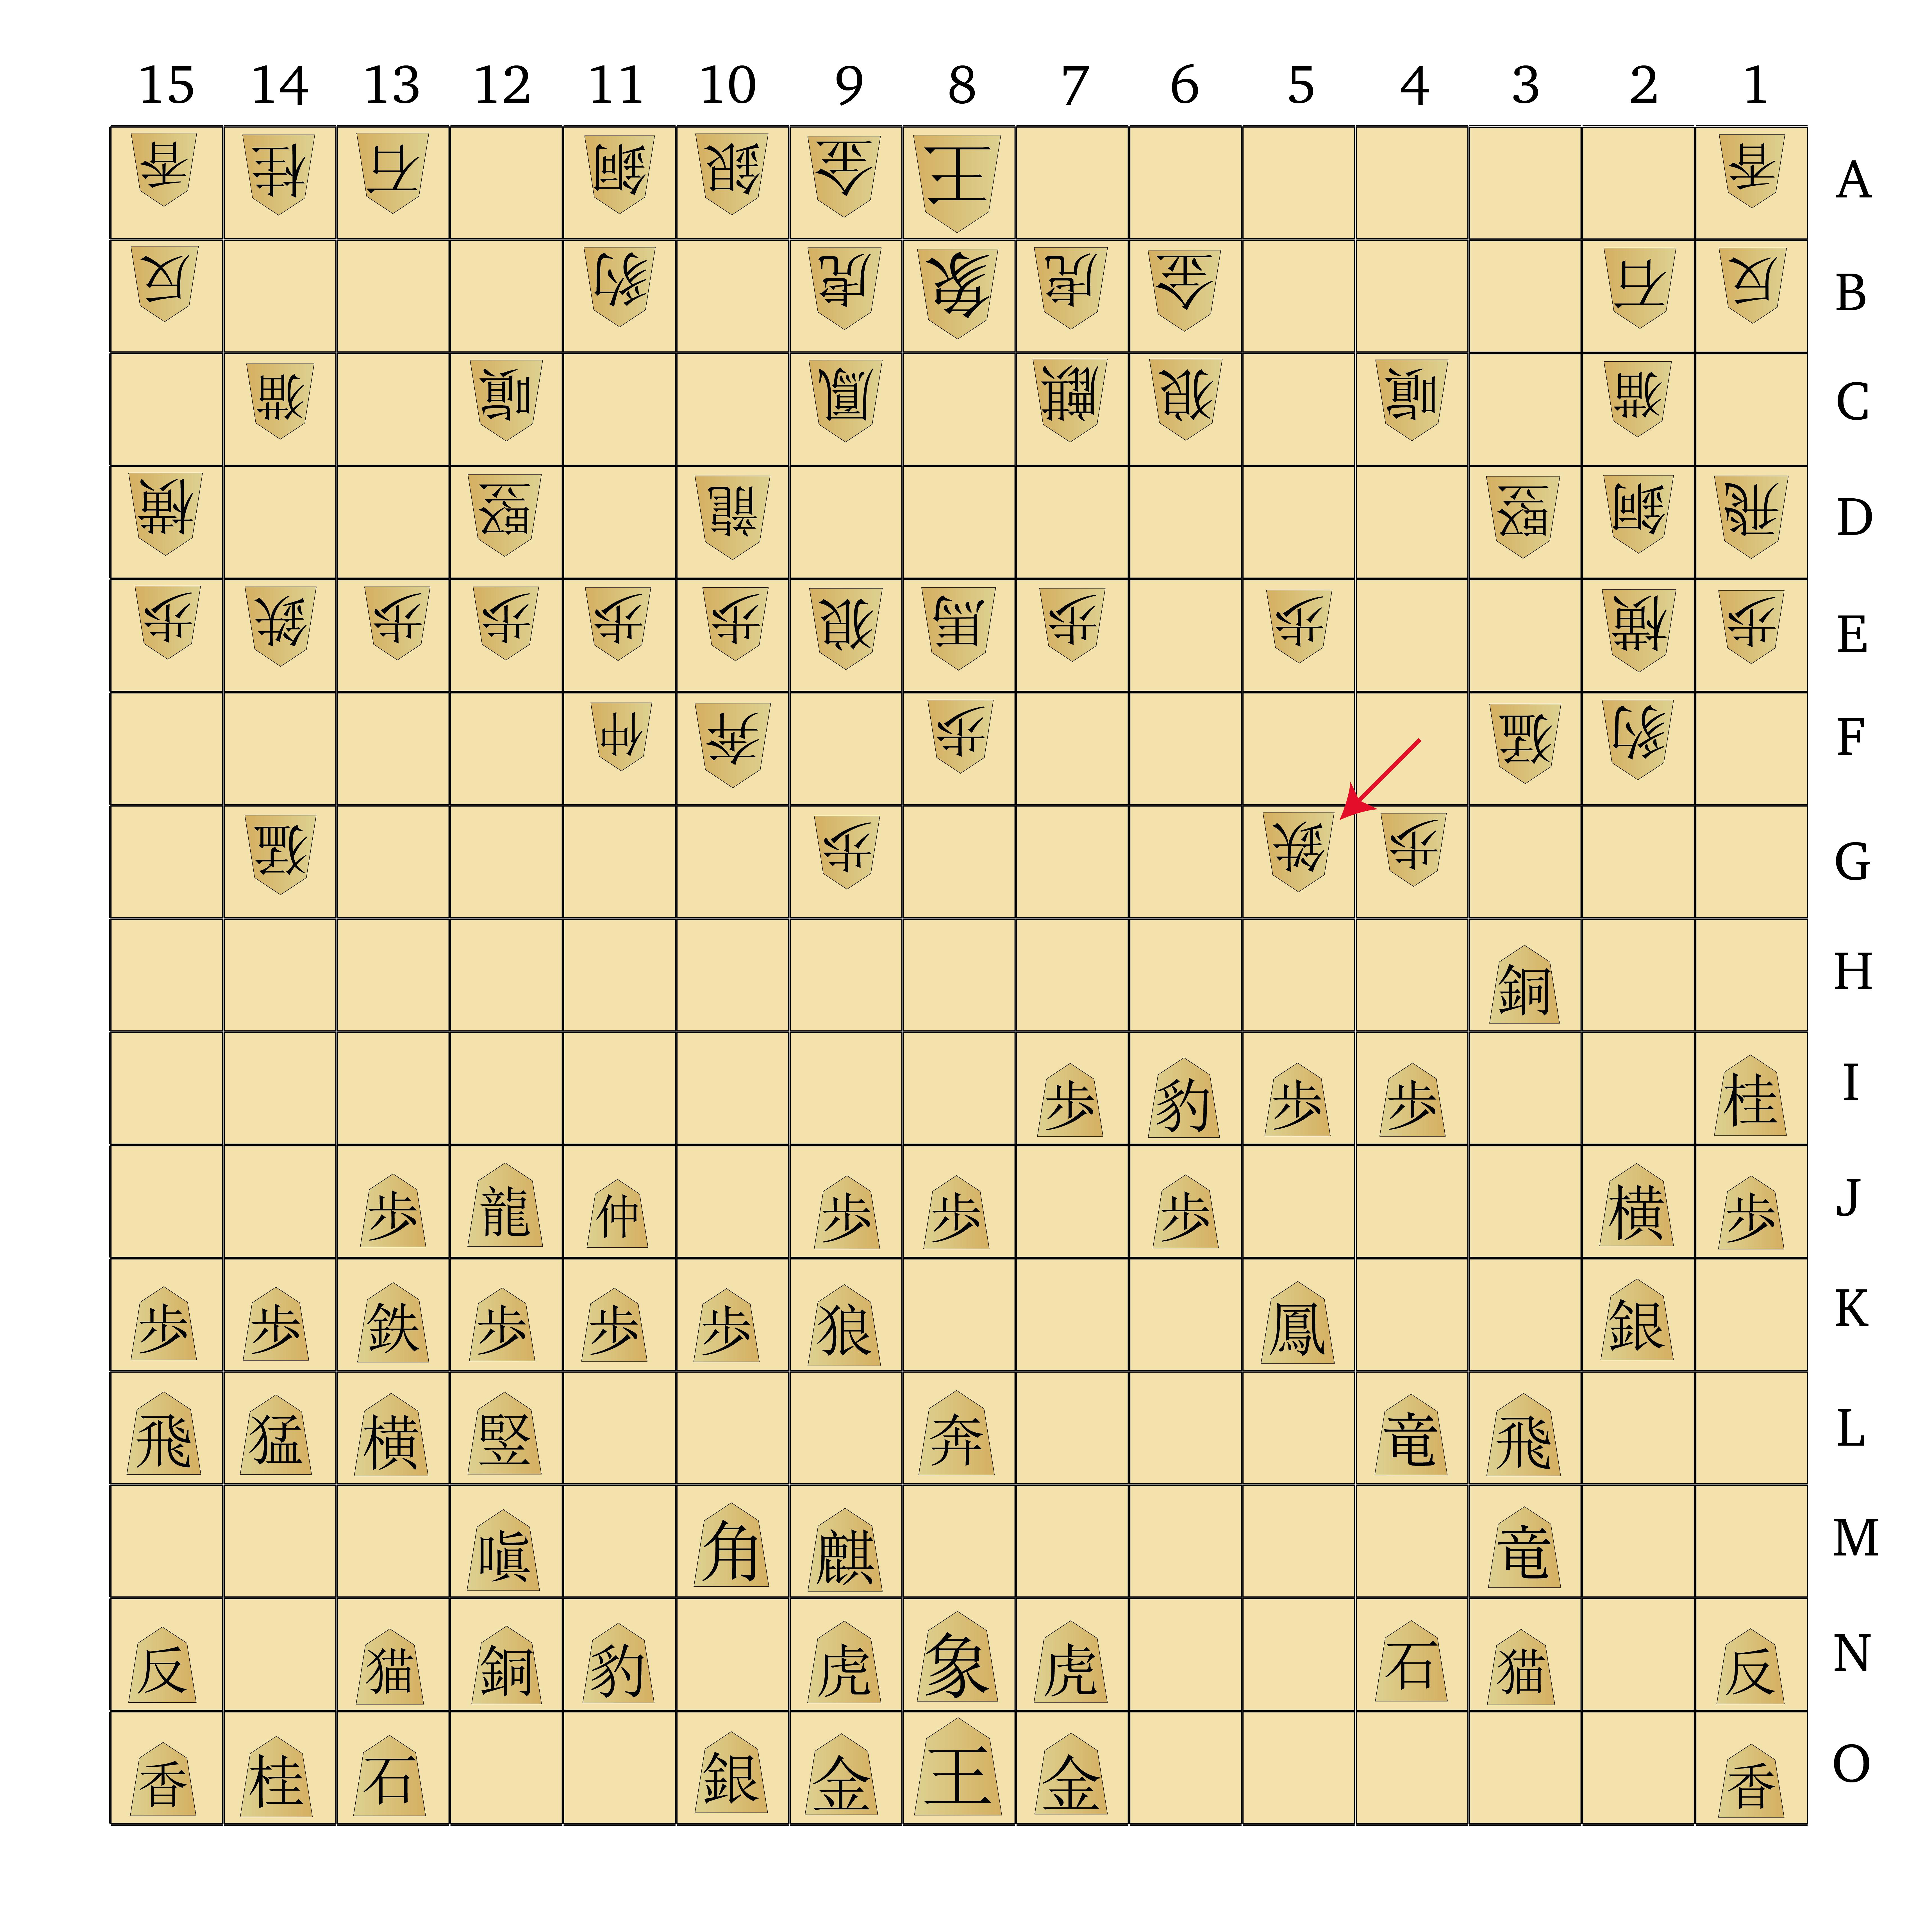 Dai Shogi 420 -- Move 190-01